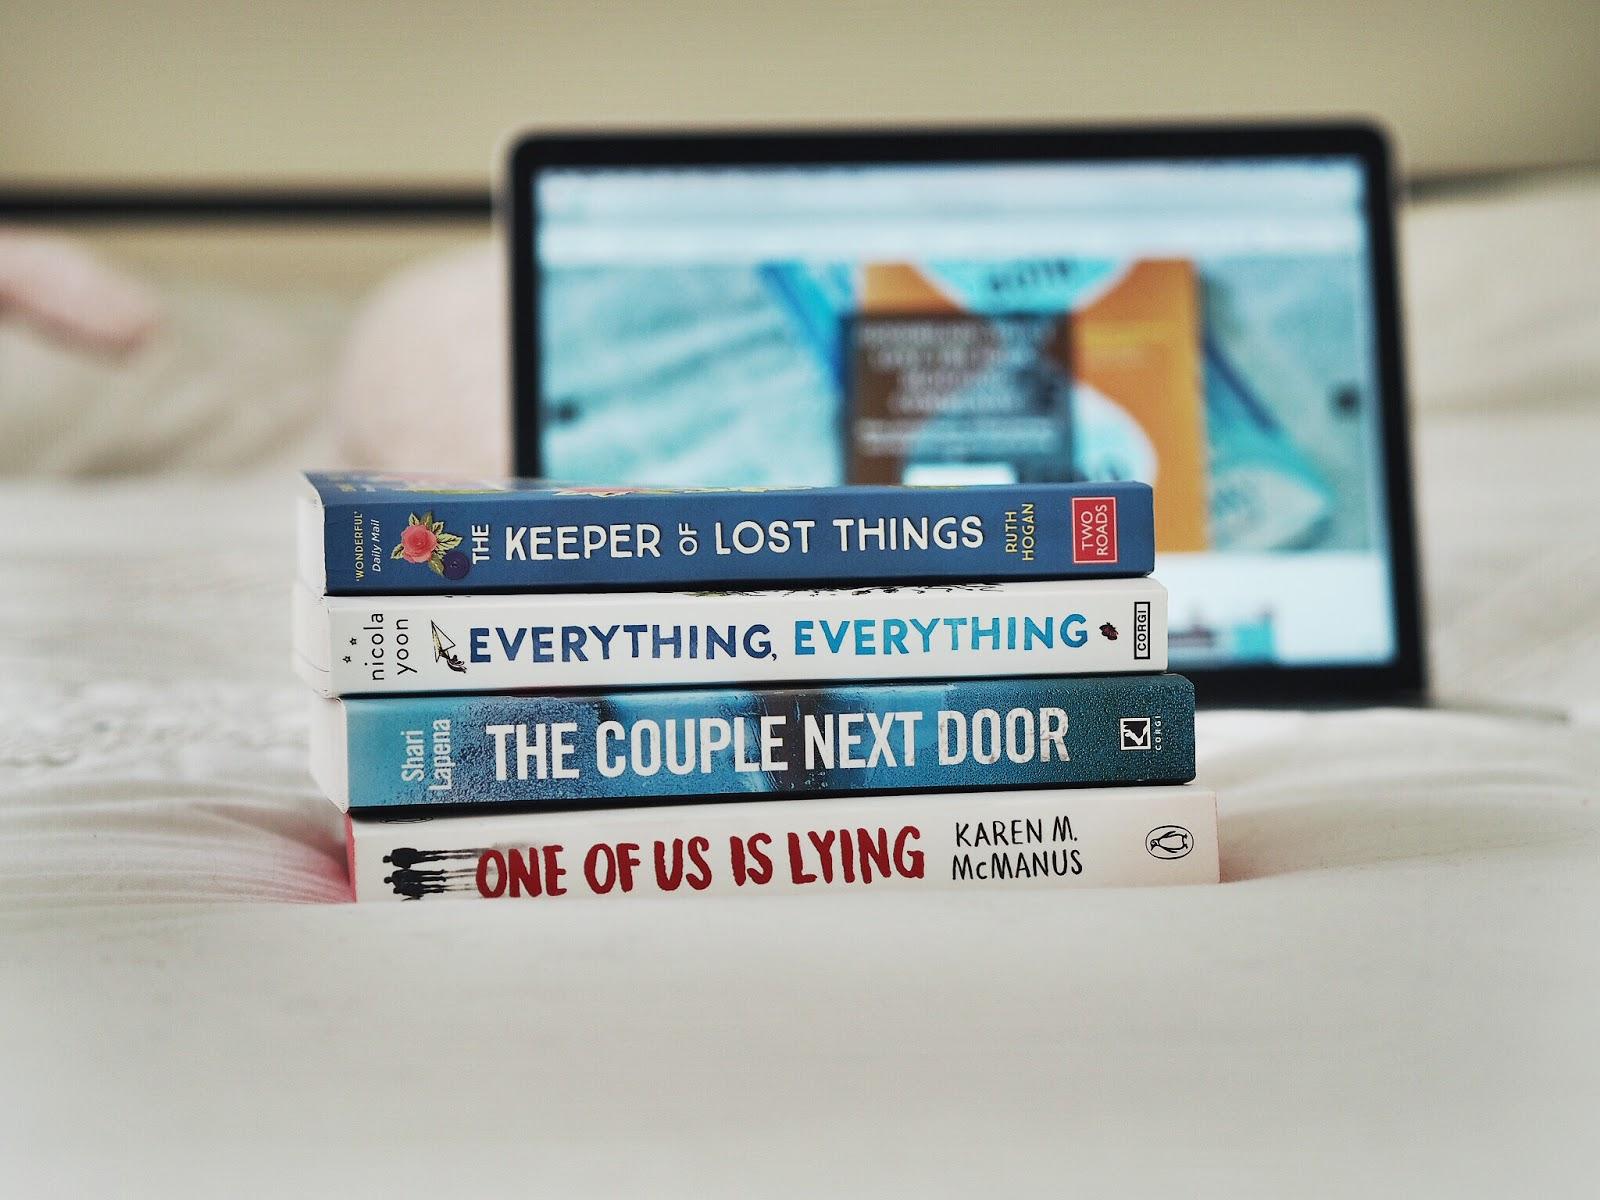 Goodreads: October/November Reading List | Hollie in Wanderlust | Book Haul | BookBlogger